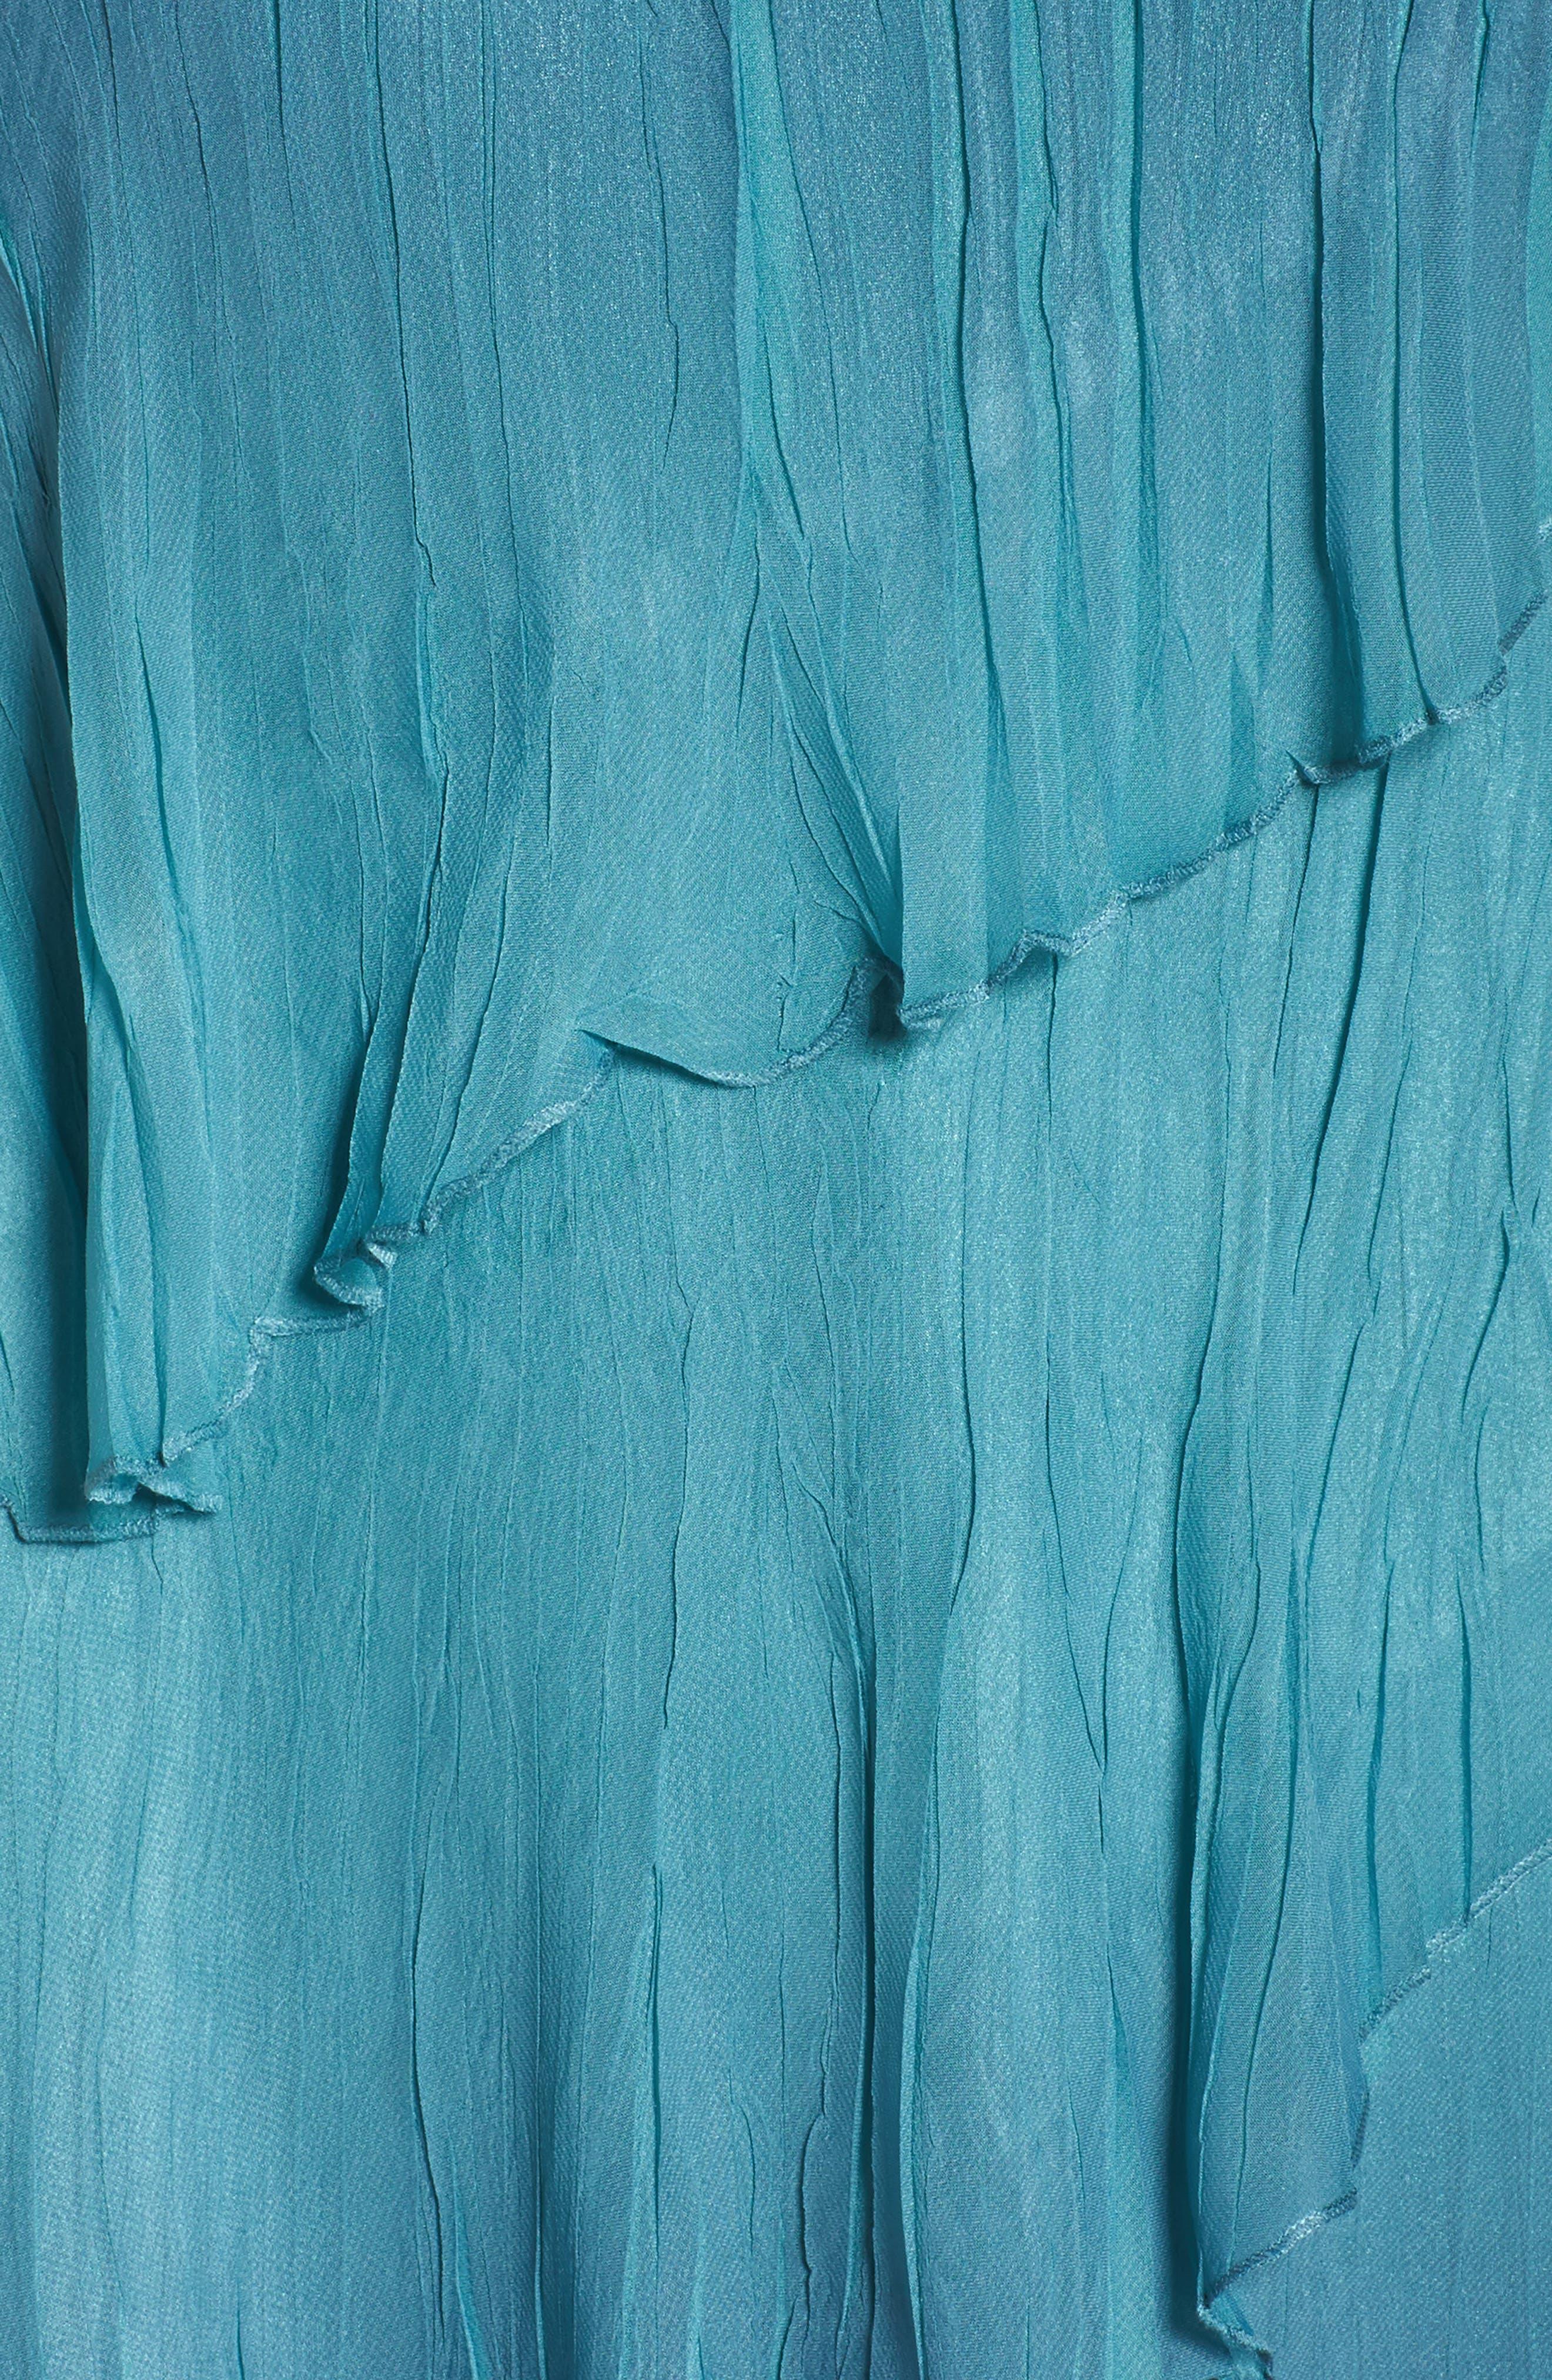 Tiered Chiffon Shift Dress with Shawl,                             Alternate thumbnail 6, color,                             491